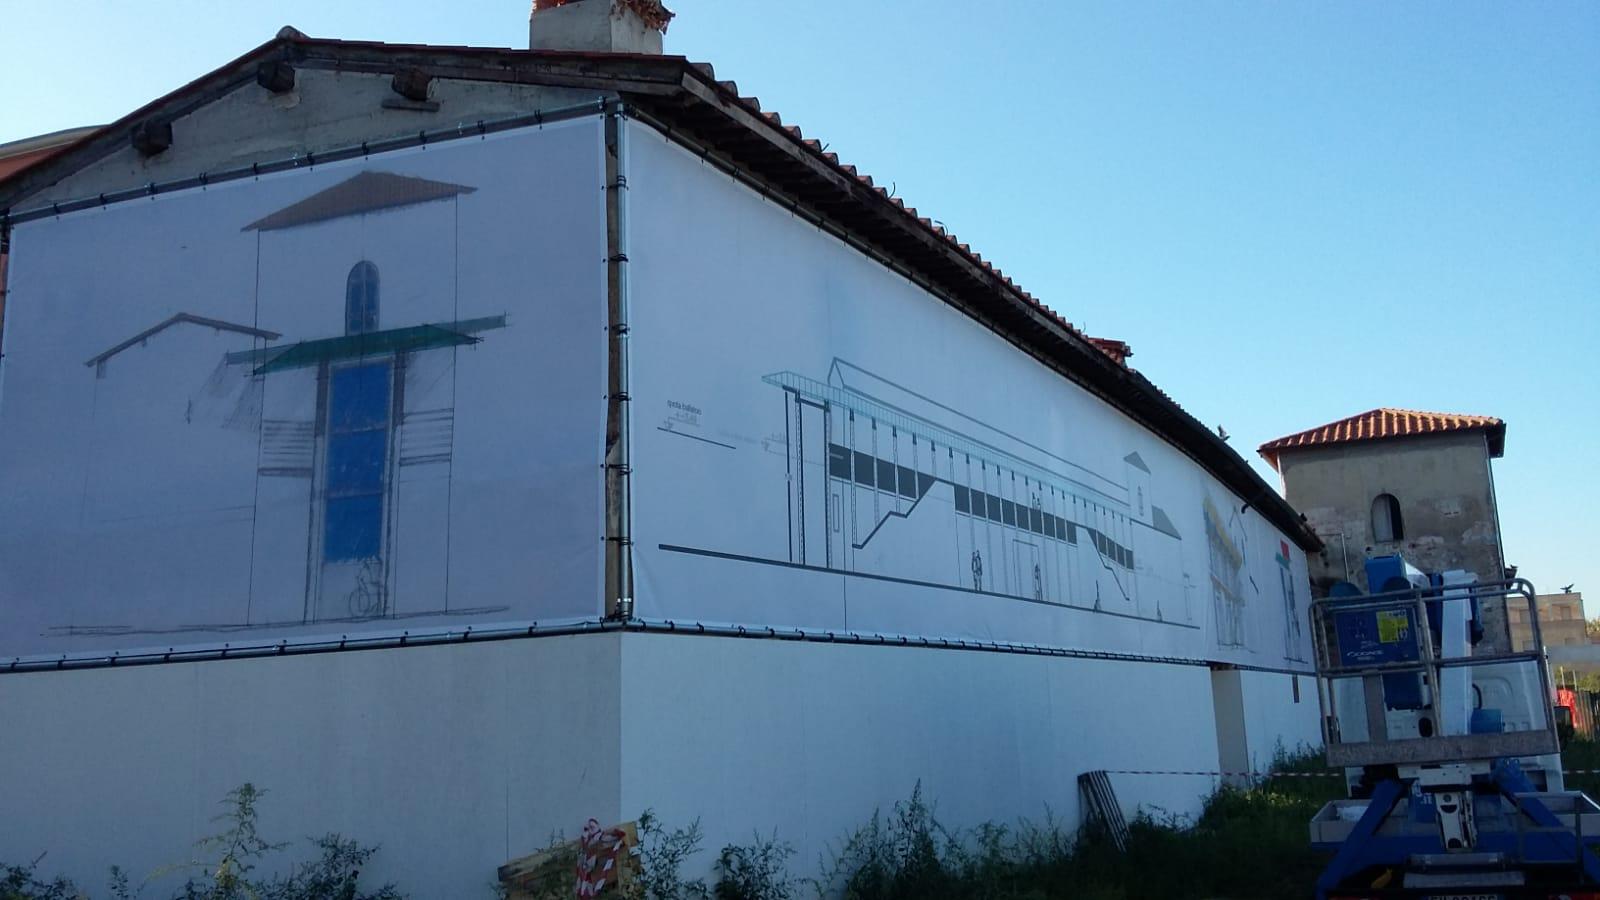 teloni PVC per copertura facciate edifici